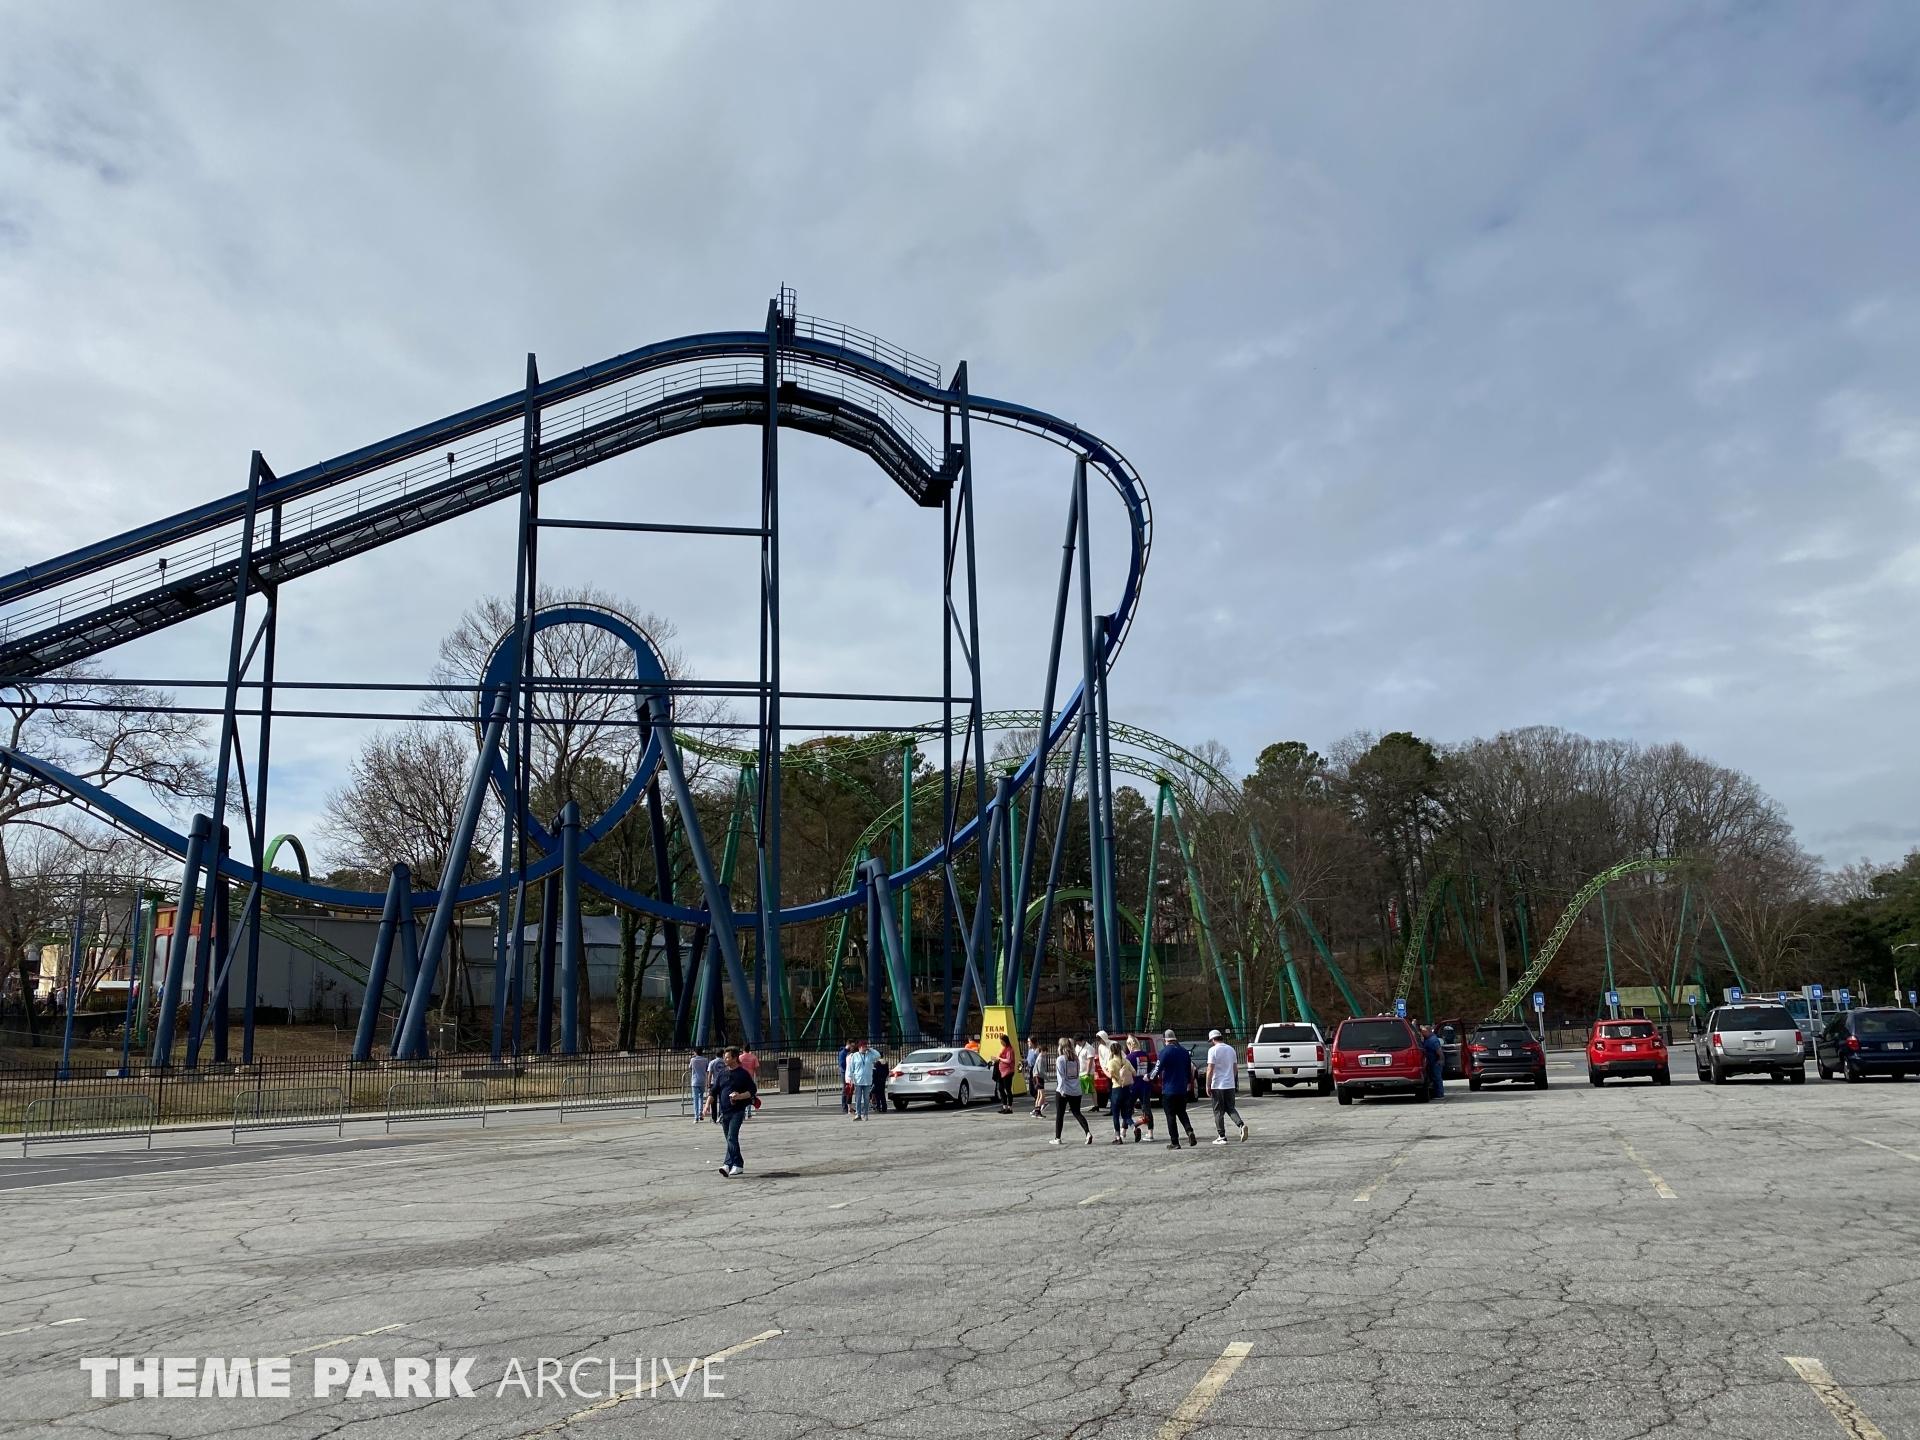 Batman The Ride at Six Flags Over Georgia